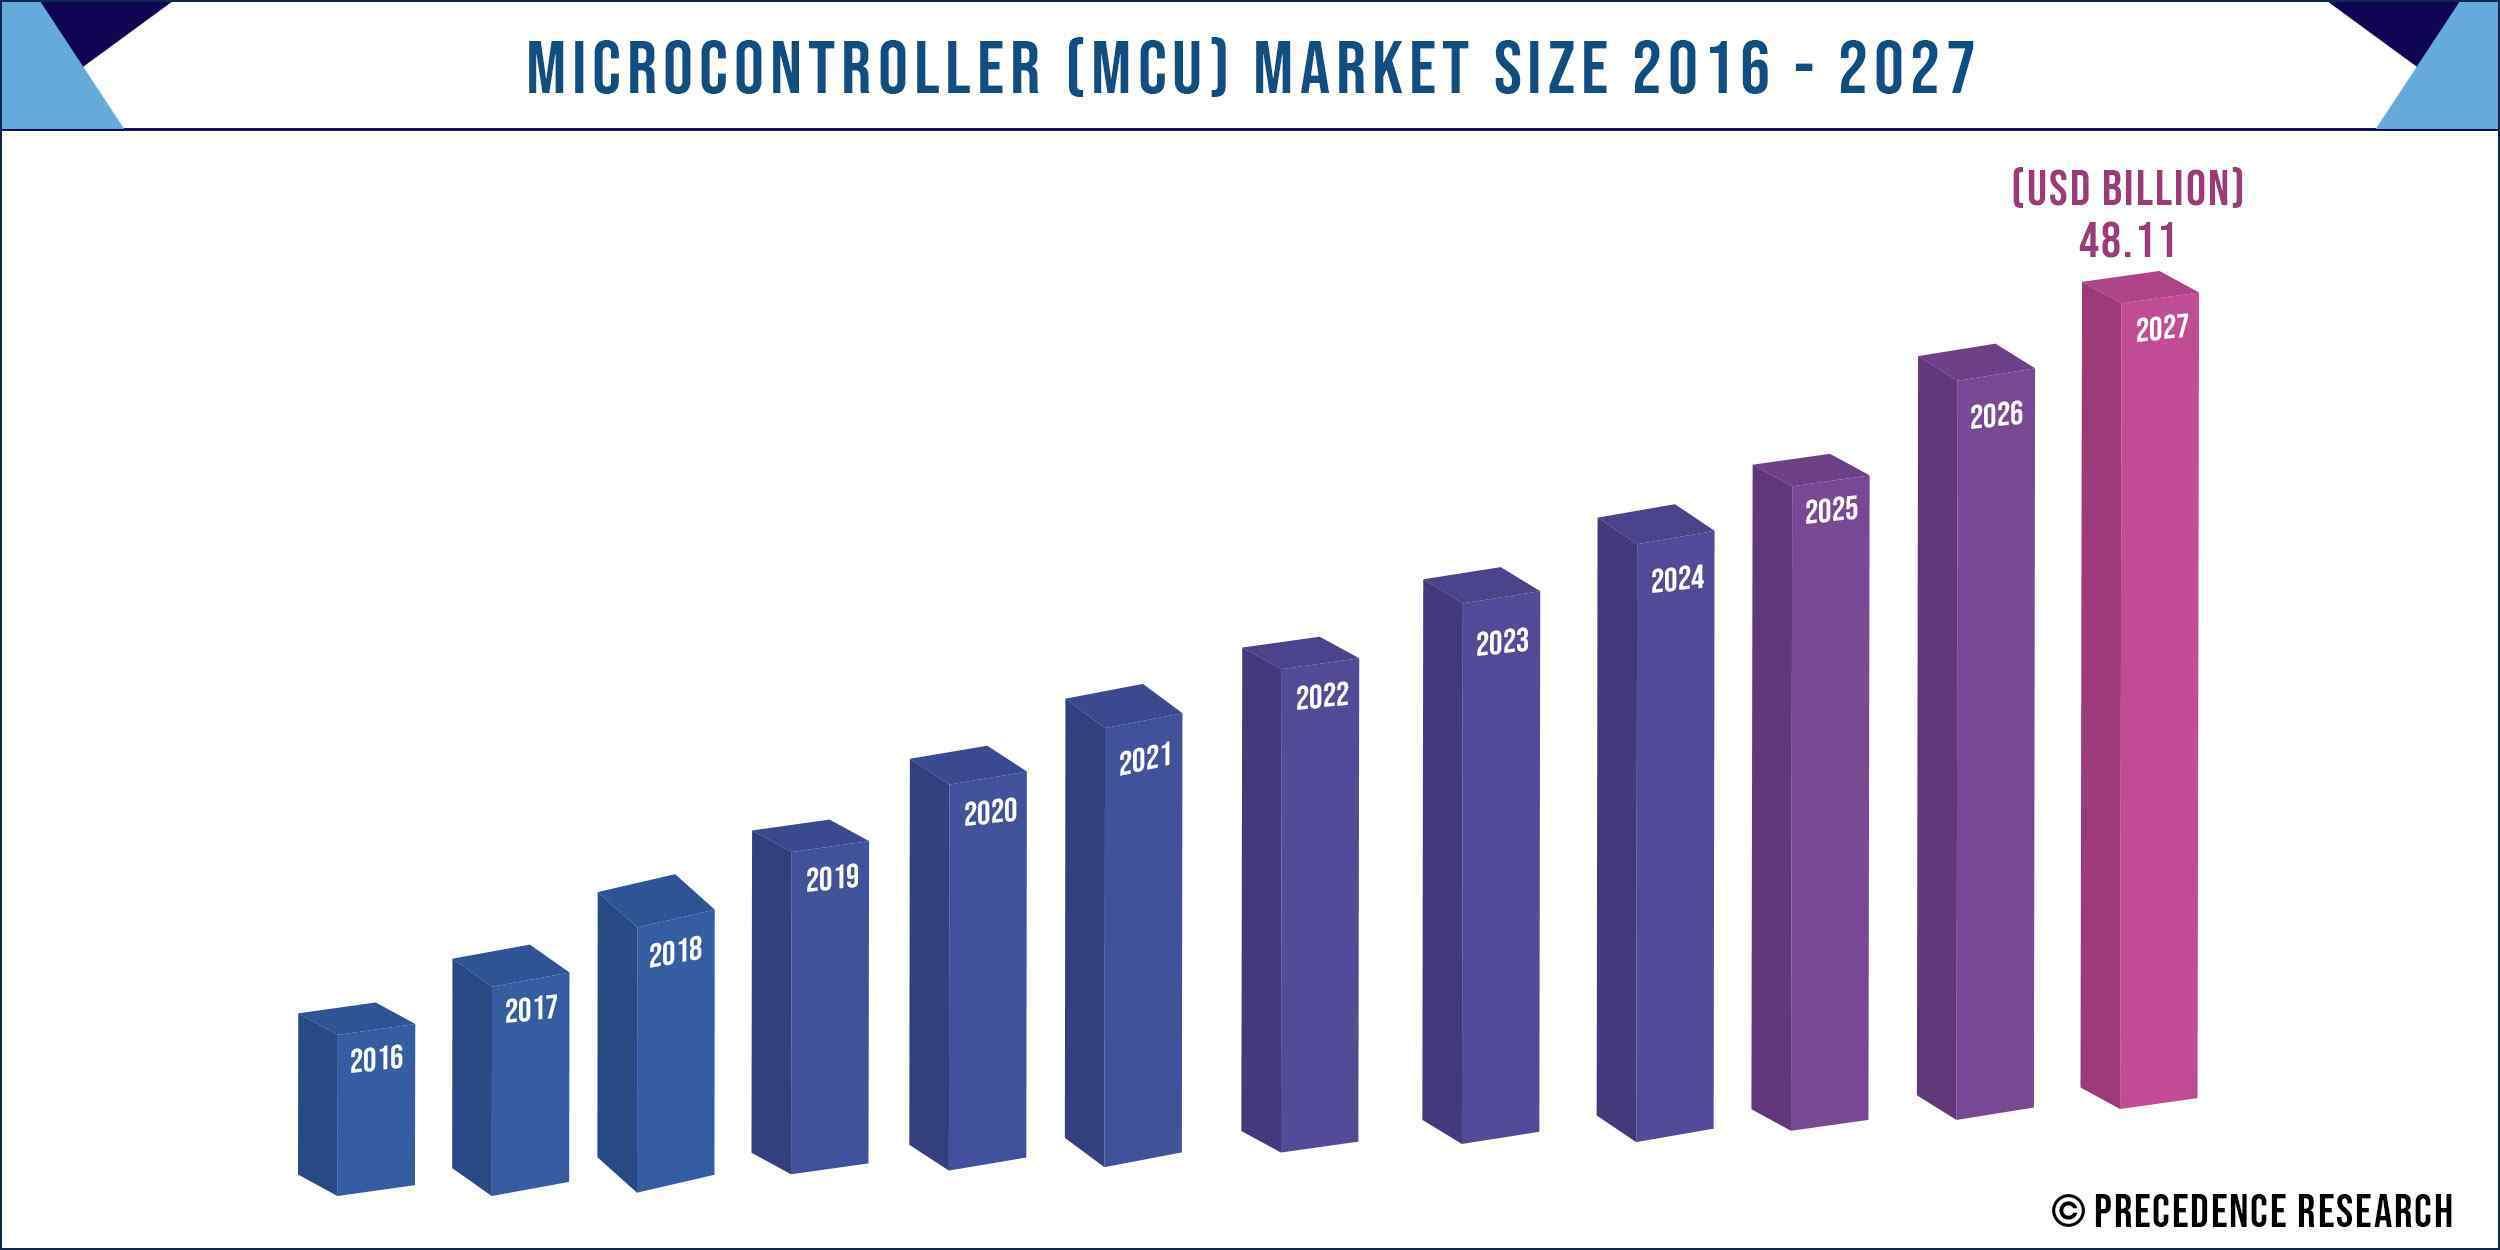 Microcontroller (MCU) Market Size 2016 to 2027